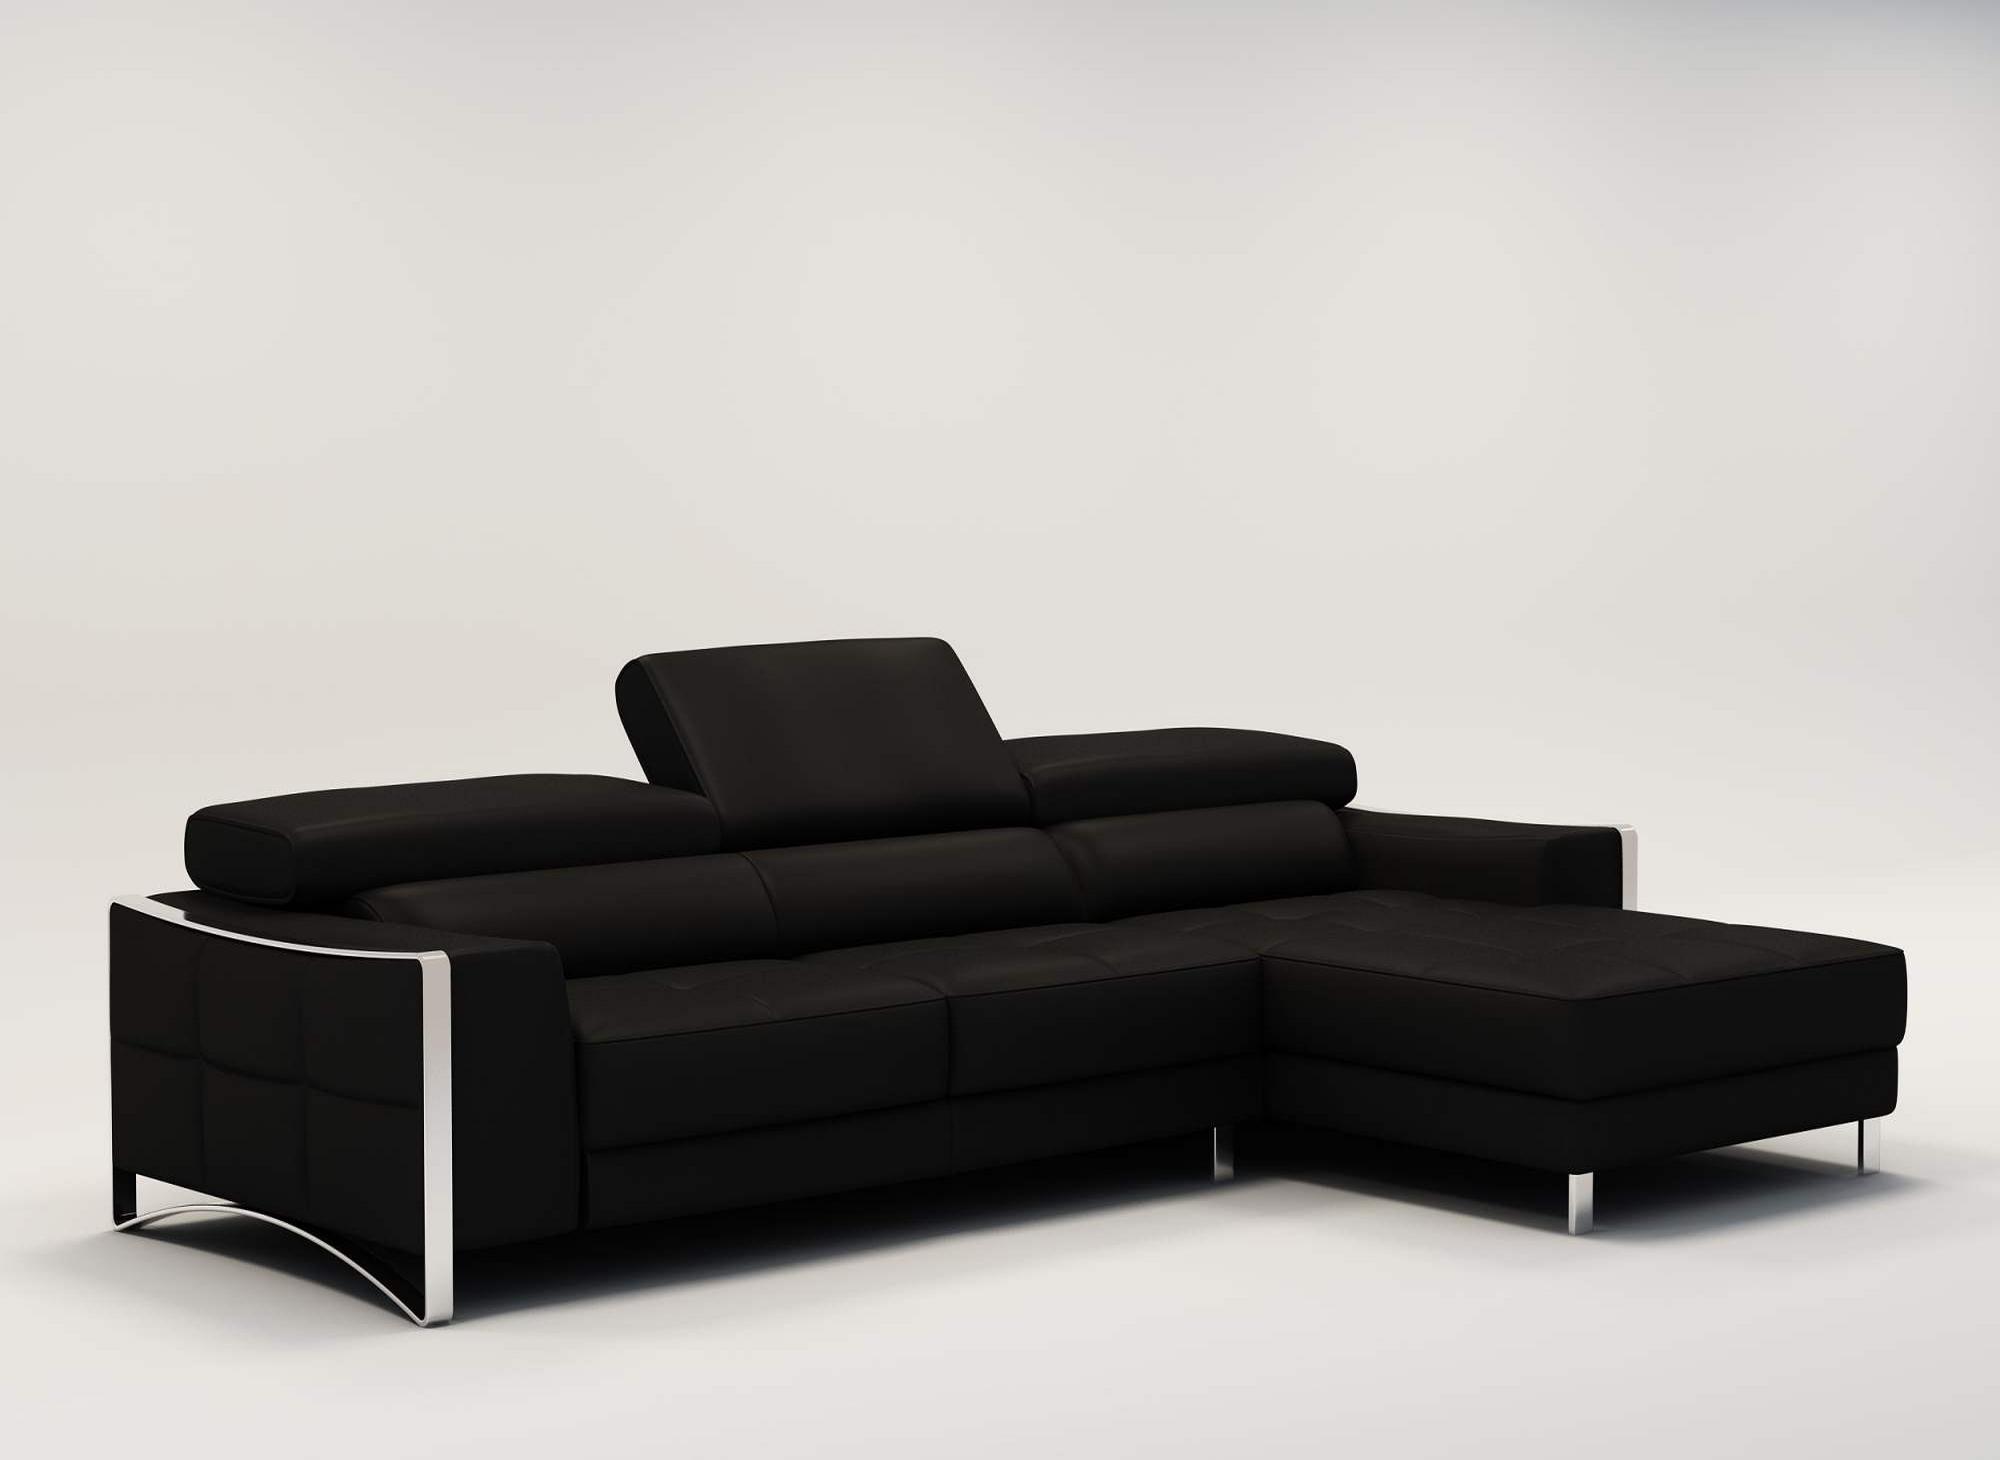 Deco in paris - Canape cuir noir design ...